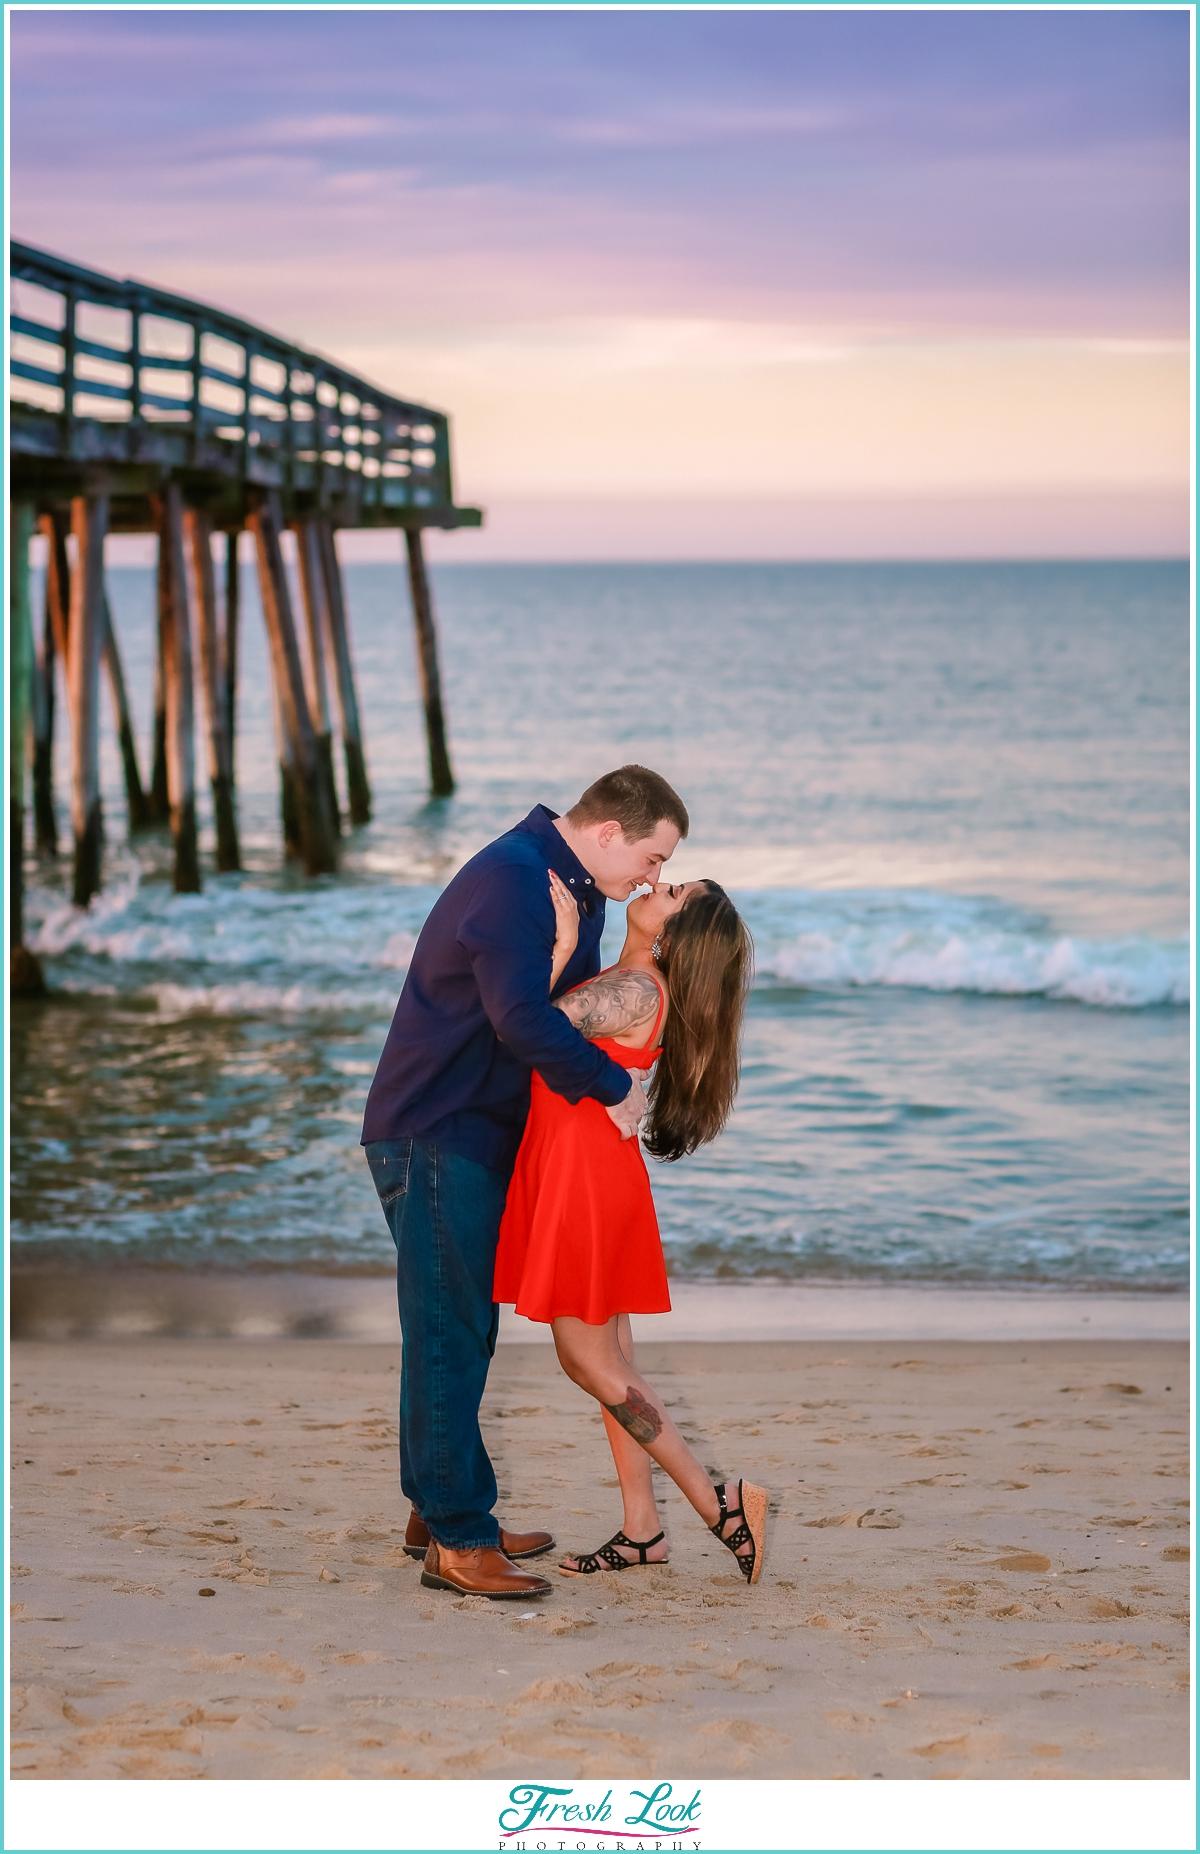 romantic sunset beach photoshoot